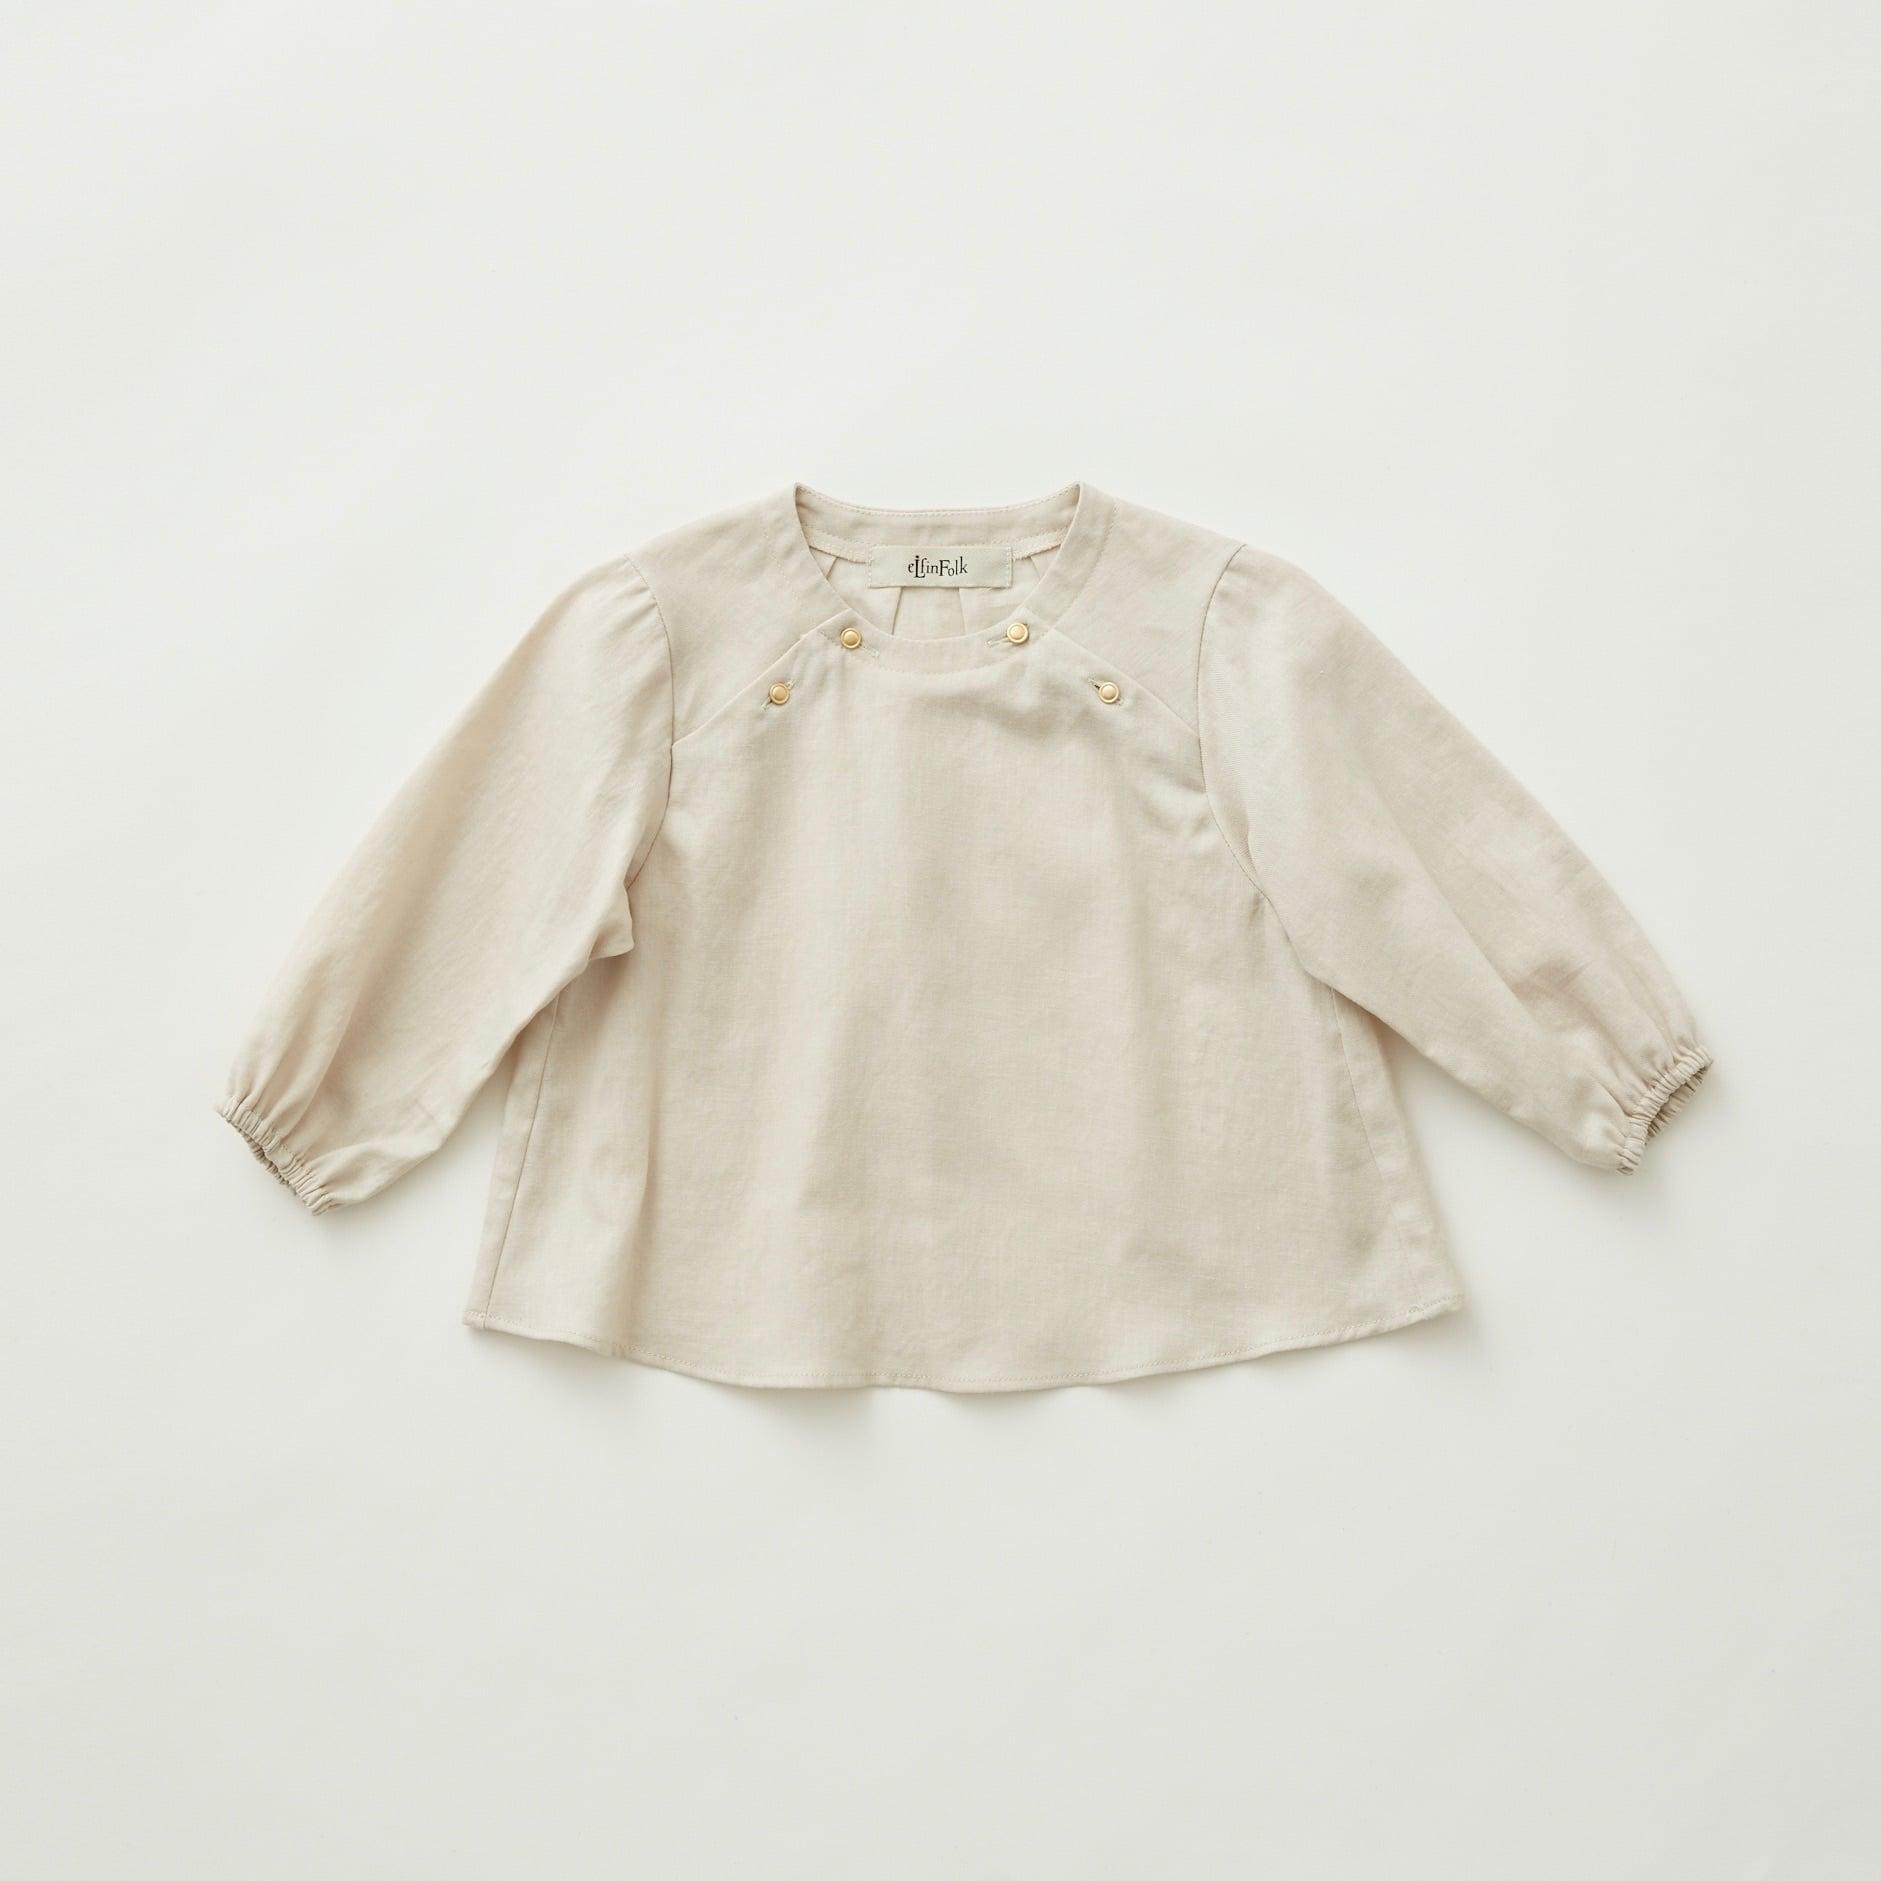 《eLfinFolk 2021AW》C/L washer  baby blouse / light beige / 80-100cm